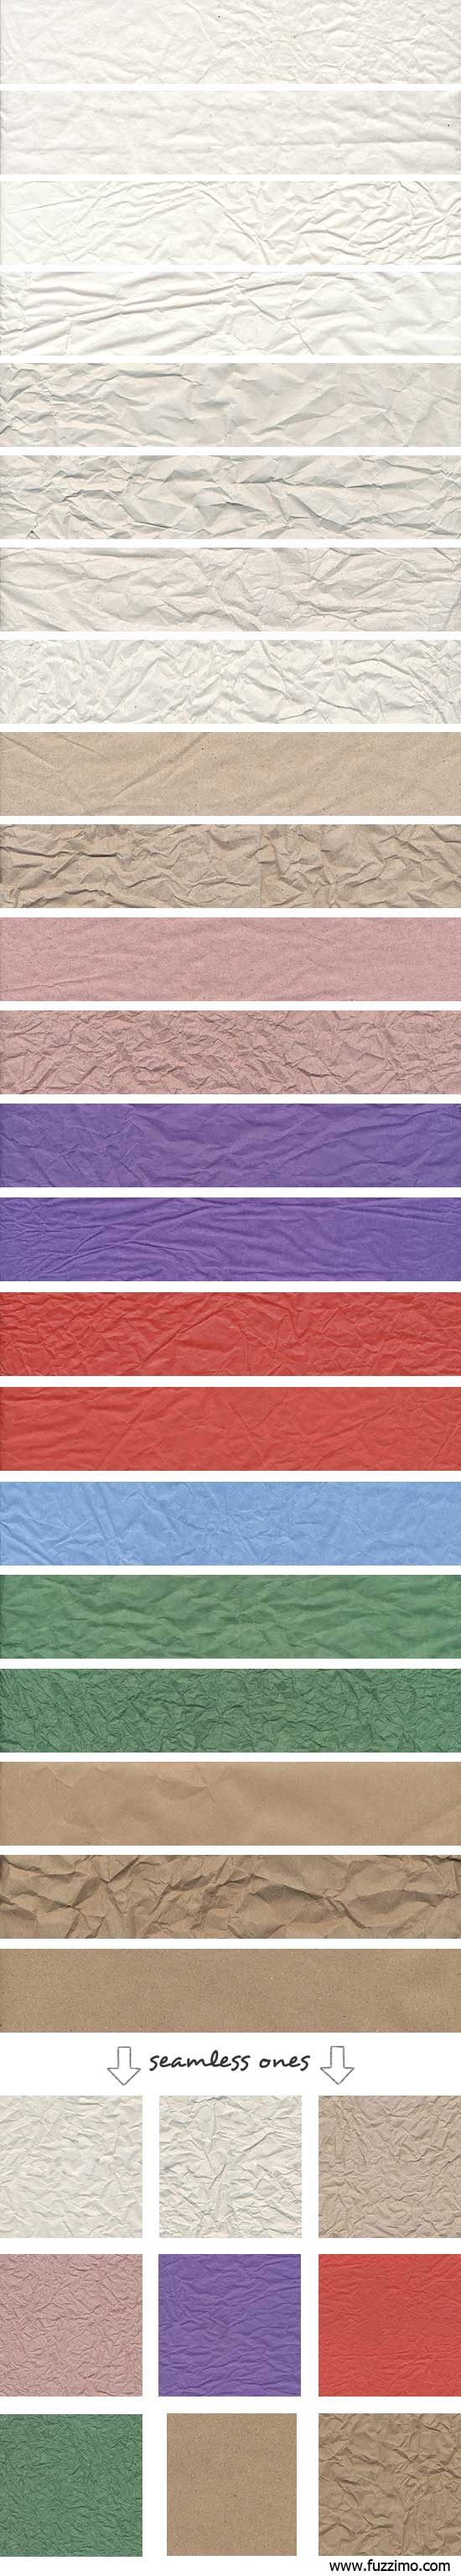 fzm-WrinkledPaper.textures-02